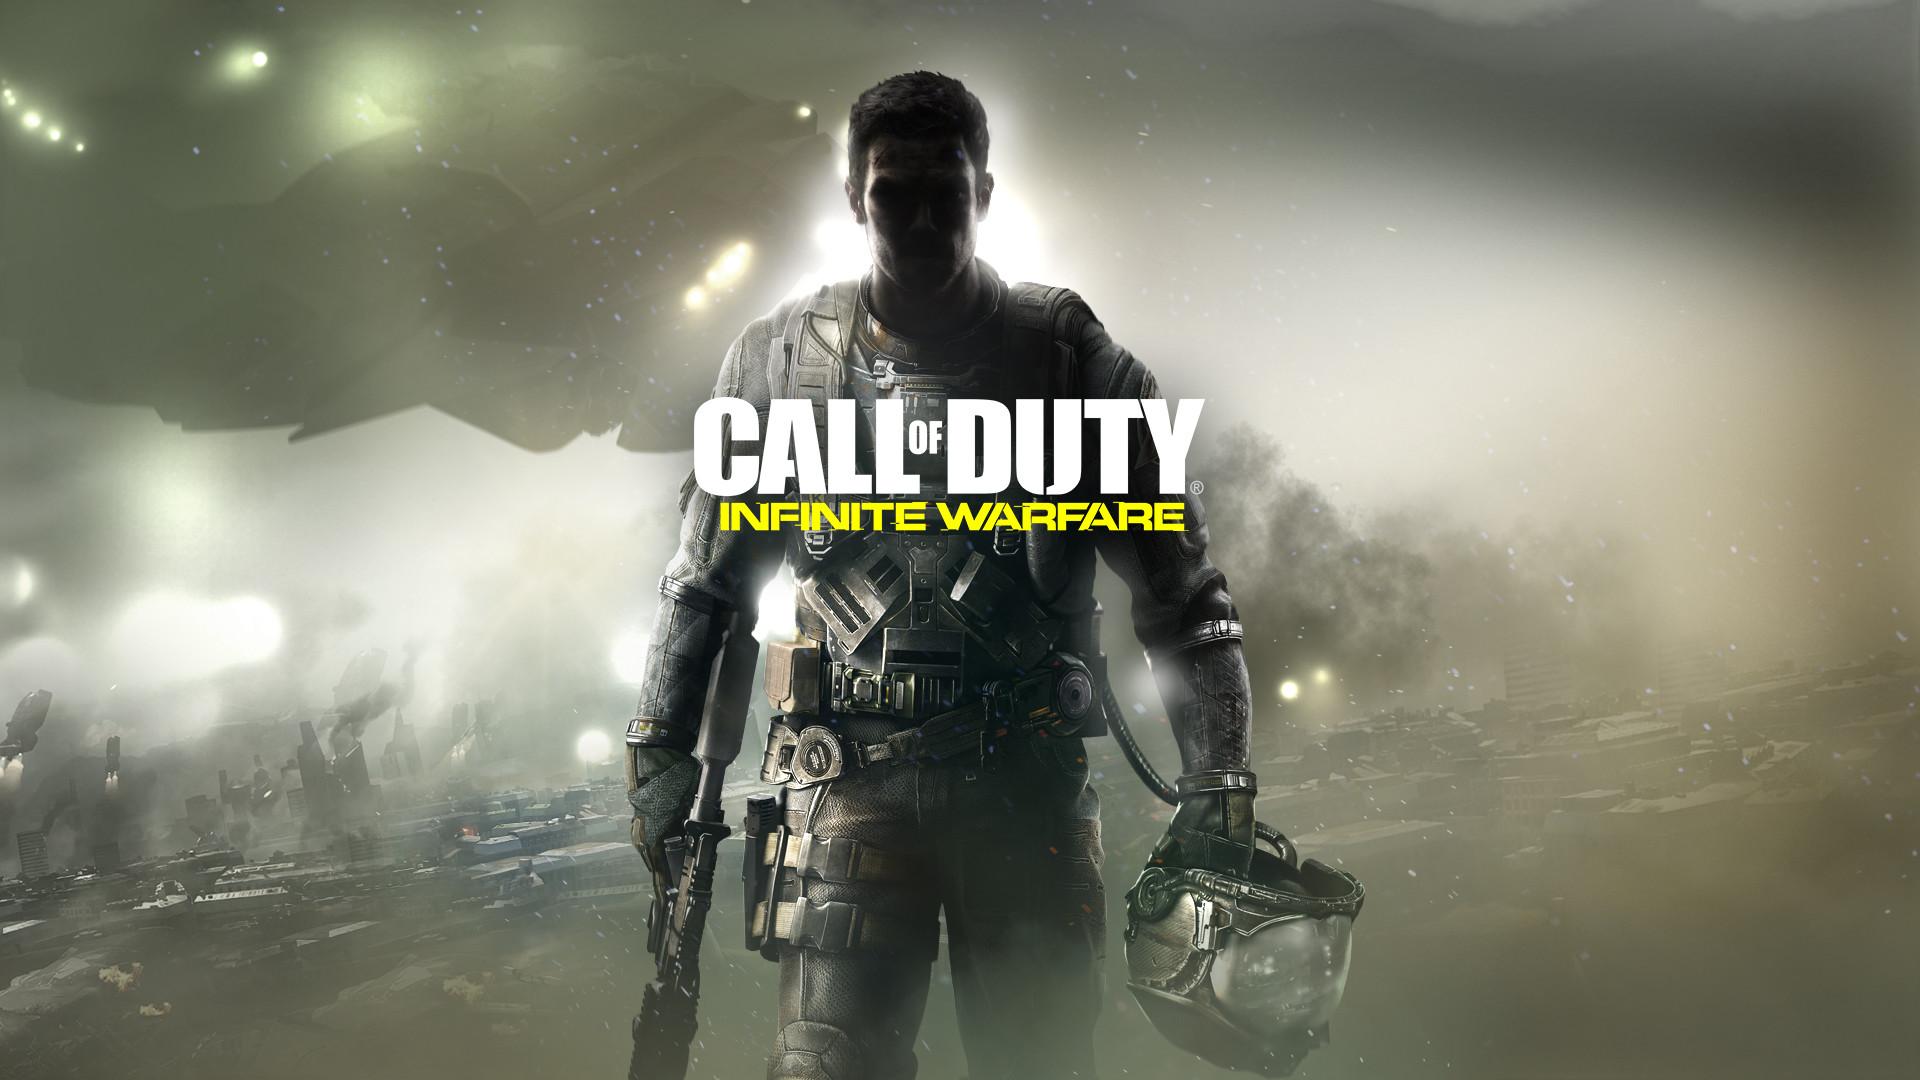 Call of Duty Infinite Warfare HD Images 2